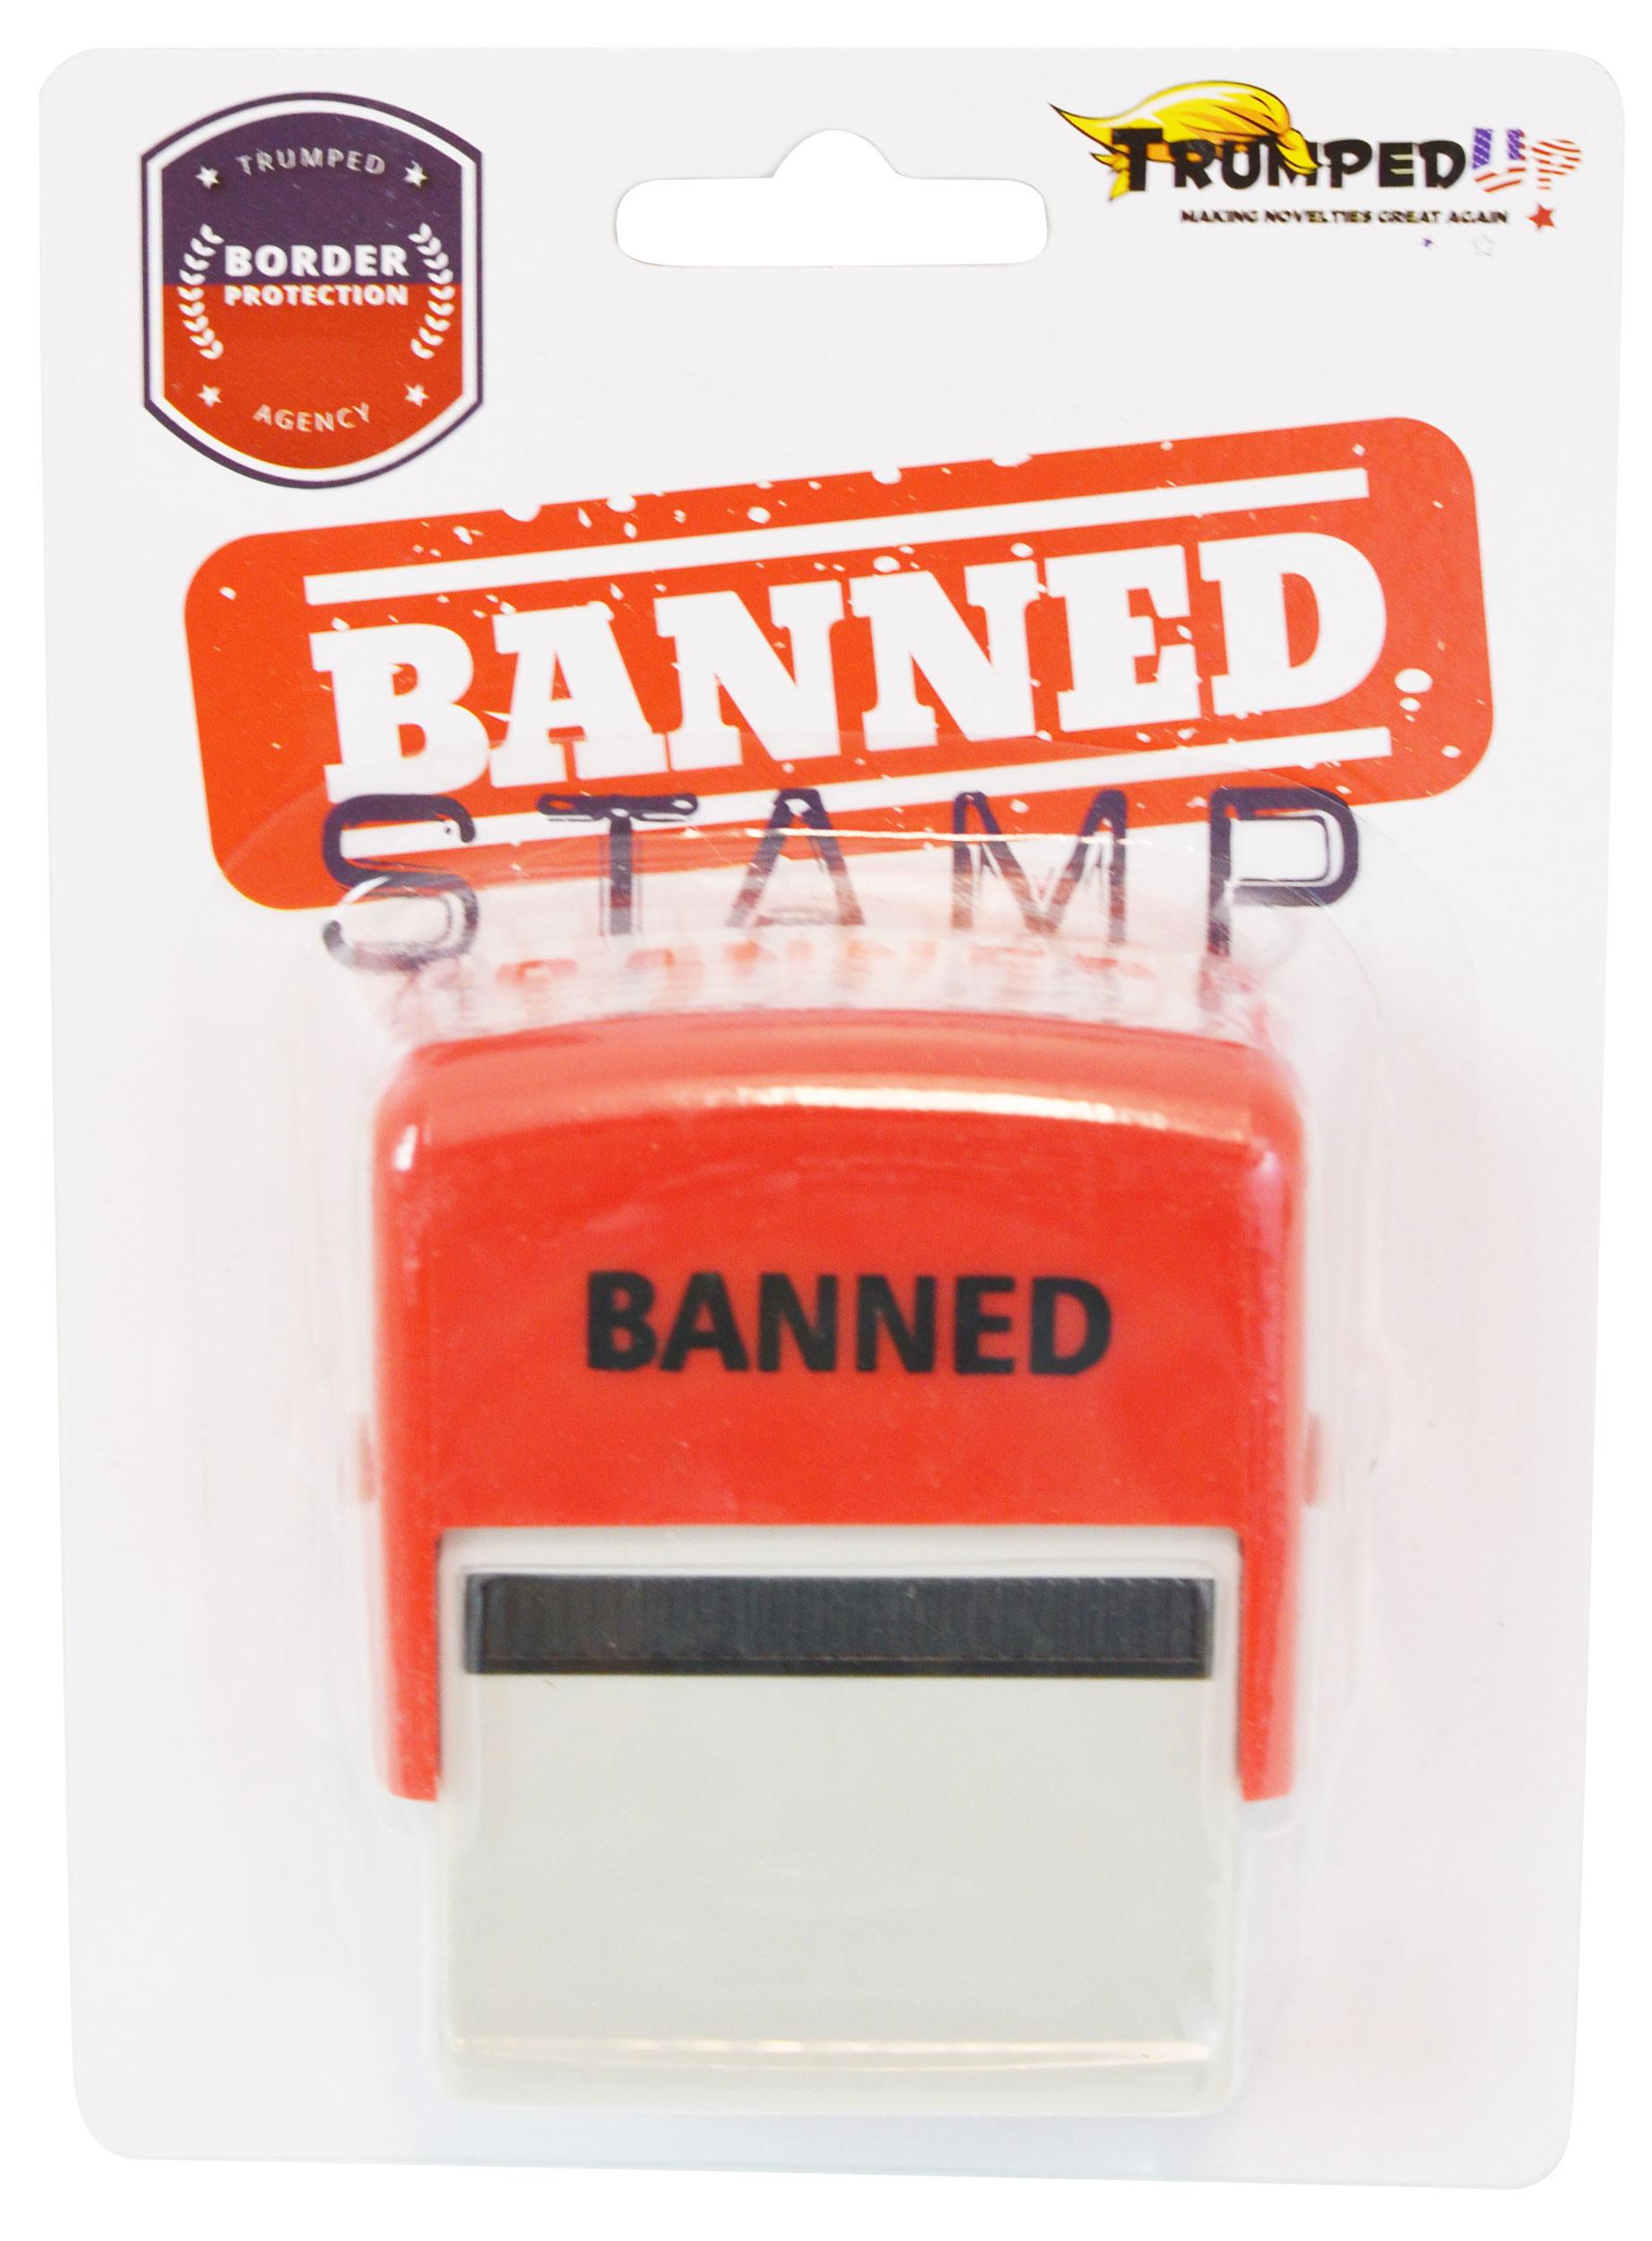 Donald Trump Banned Stamp TrumpedUp